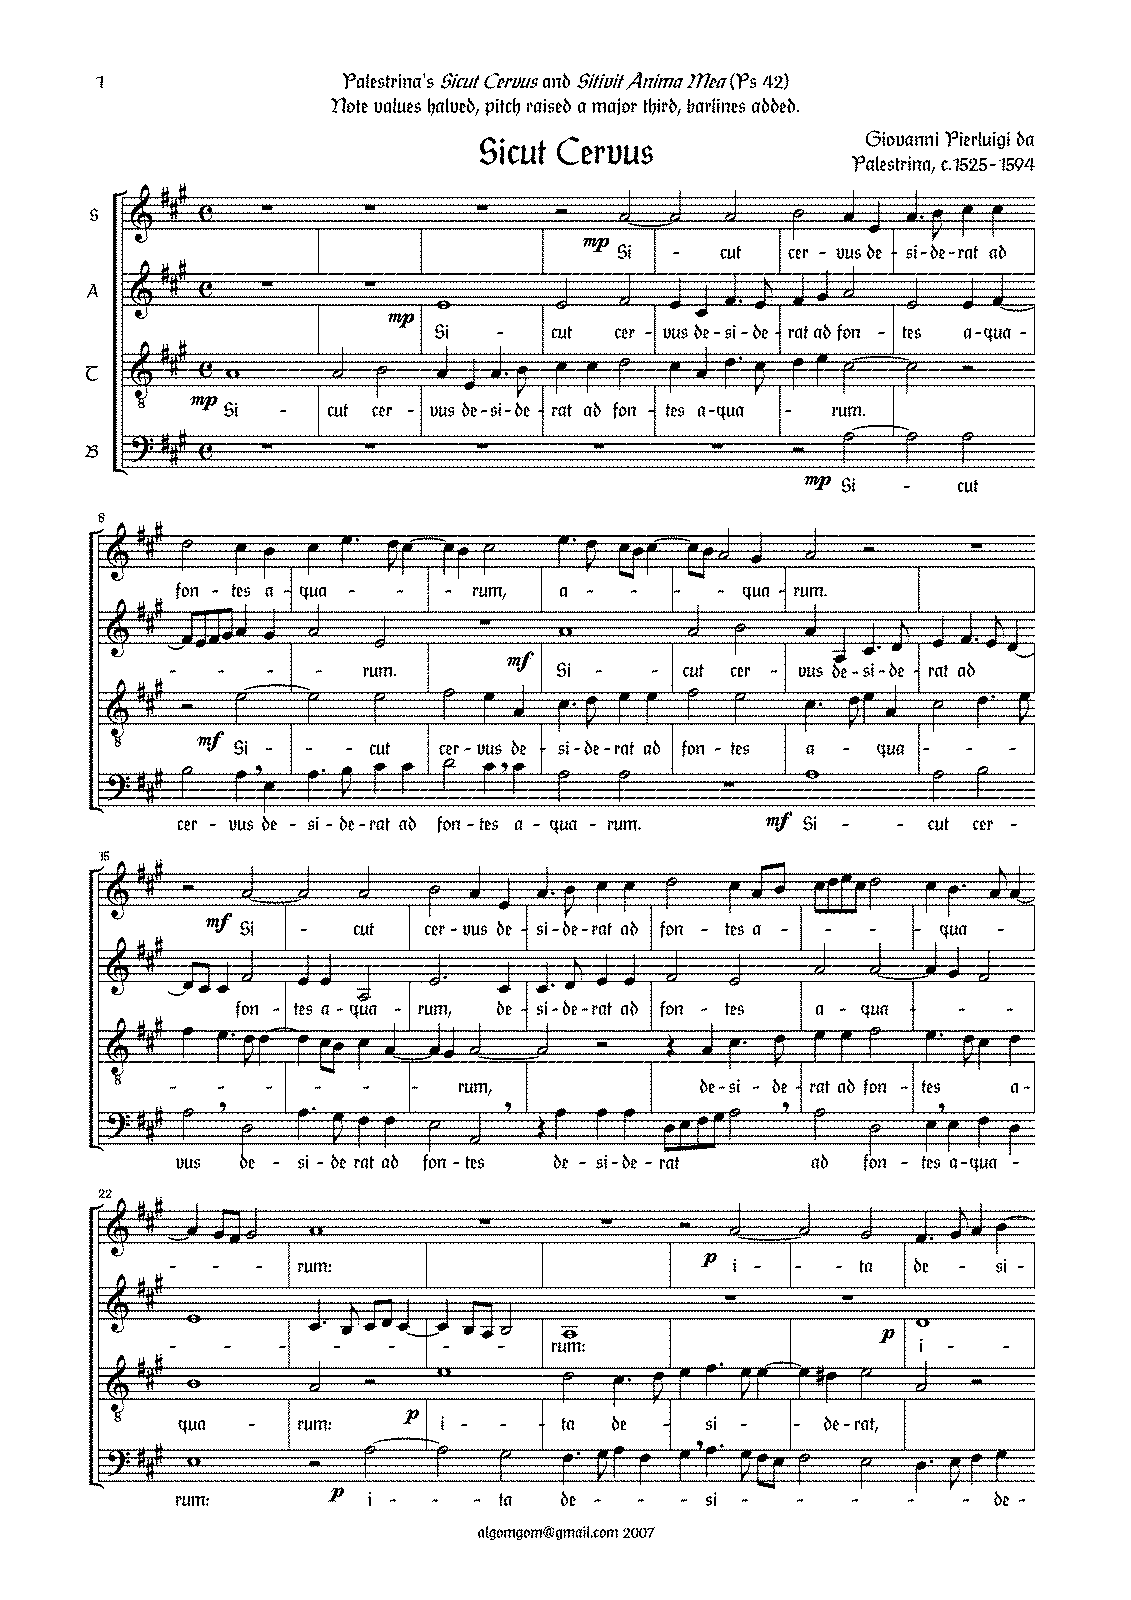 sicut cervus Sicut cervus and its secunda pars sitivit anima mea are a setting of psalm 42, by  giovanni pierluigi da palestrina (c 1526 - 1594) this is an.